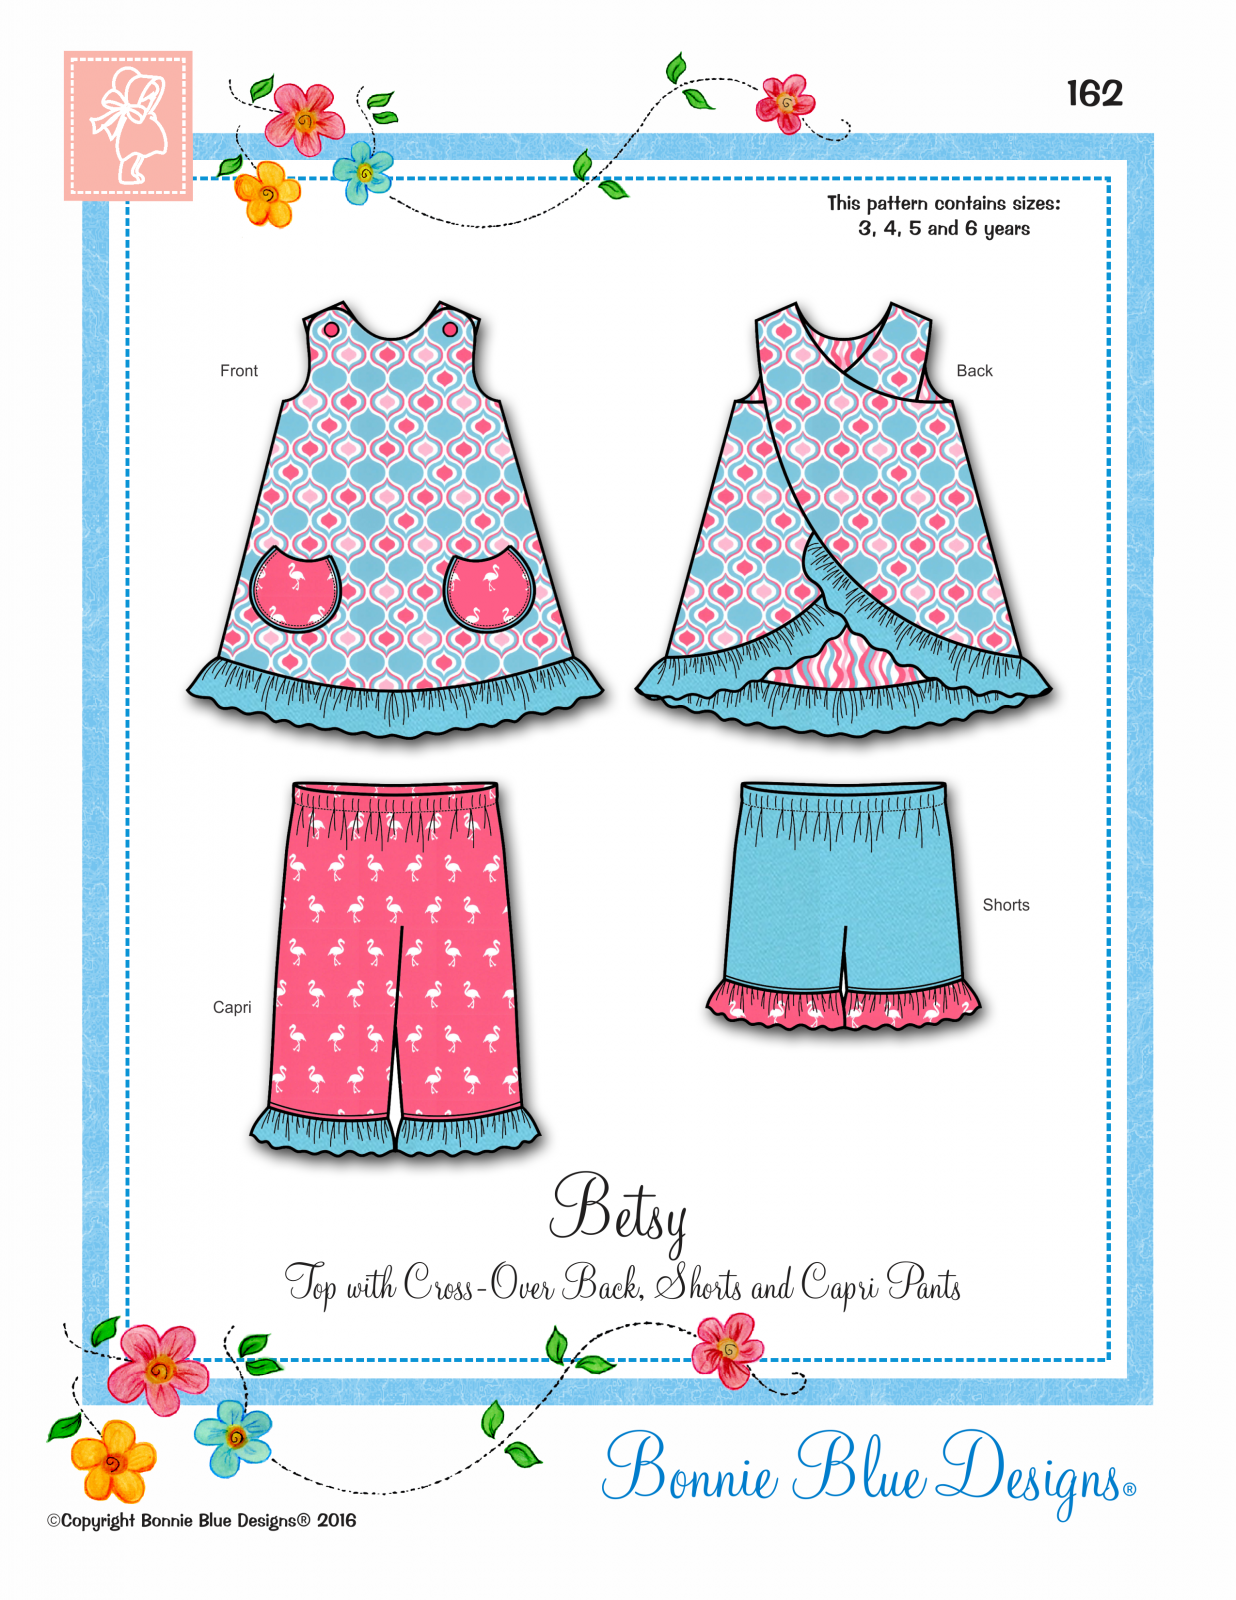 Betsy, Bonnie Blue Designs,162